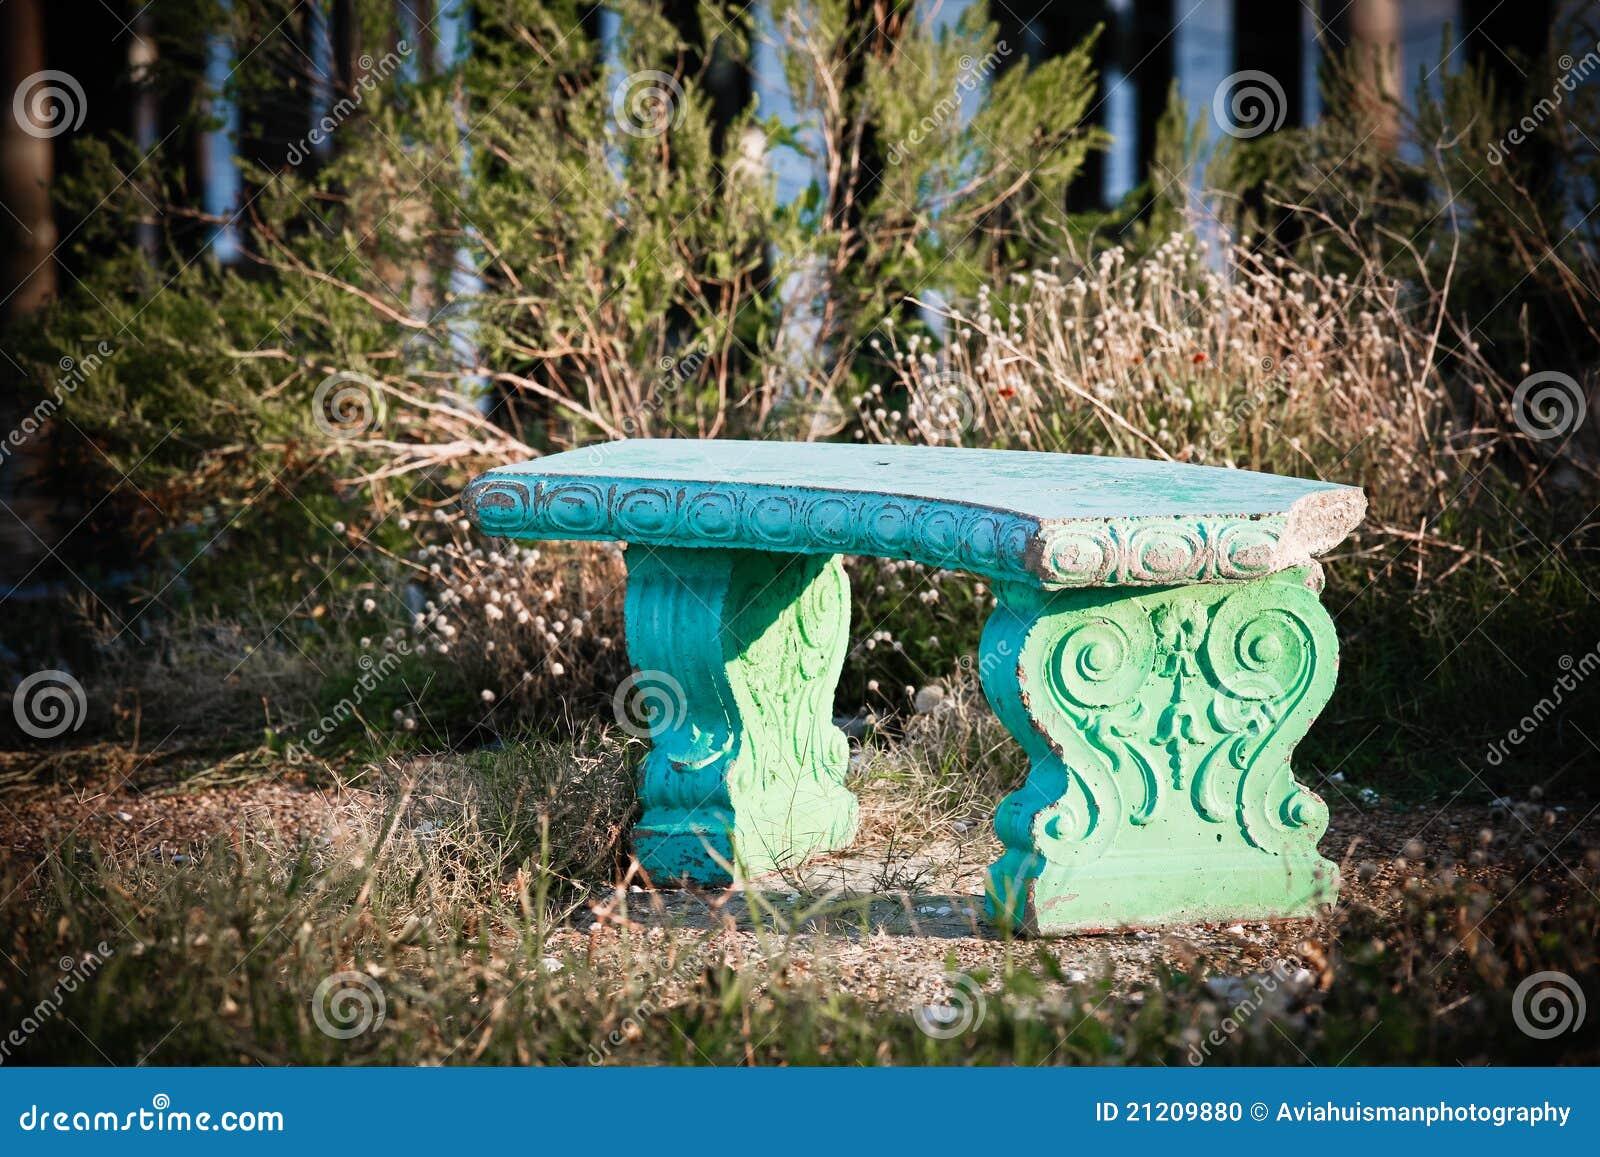 Tremendous Secret Lovers Garden Bench Stock Photo Image Of Lovers Evergreenethics Interior Chair Design Evergreenethicsorg